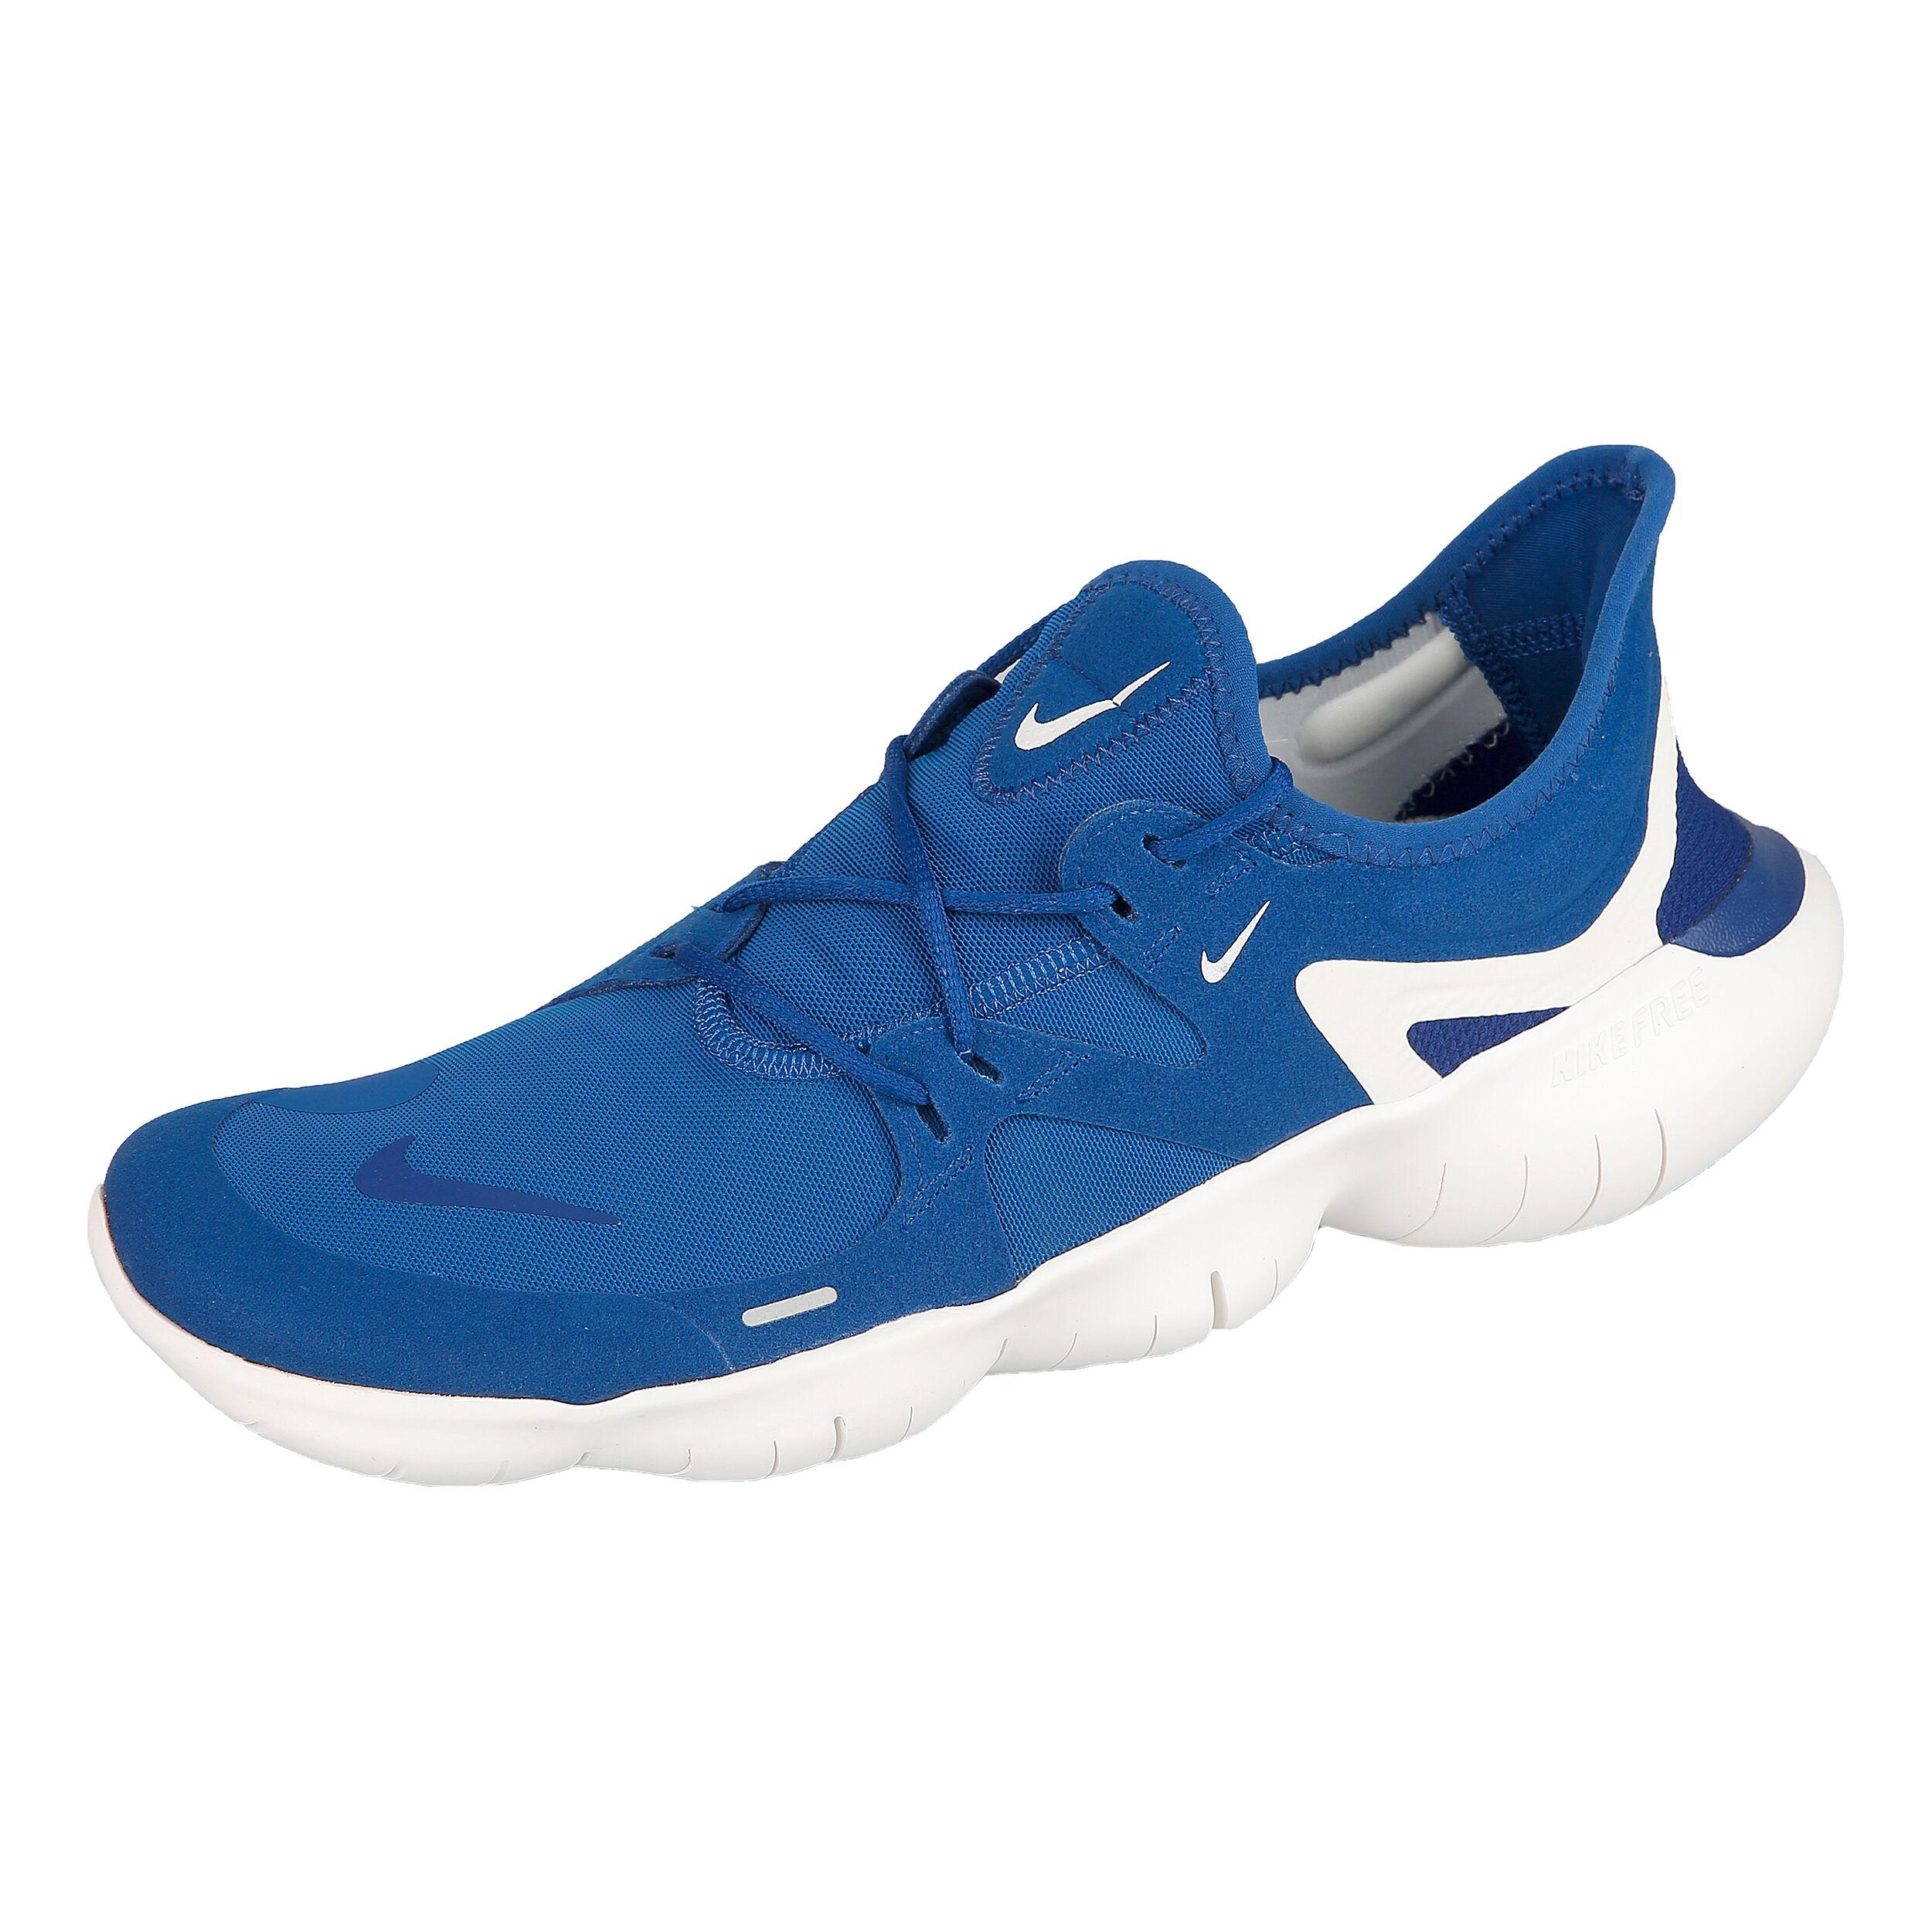 Free Running 0 Herren Natural Nike Schuh BlauWeiß 5 Nnw0mv8O